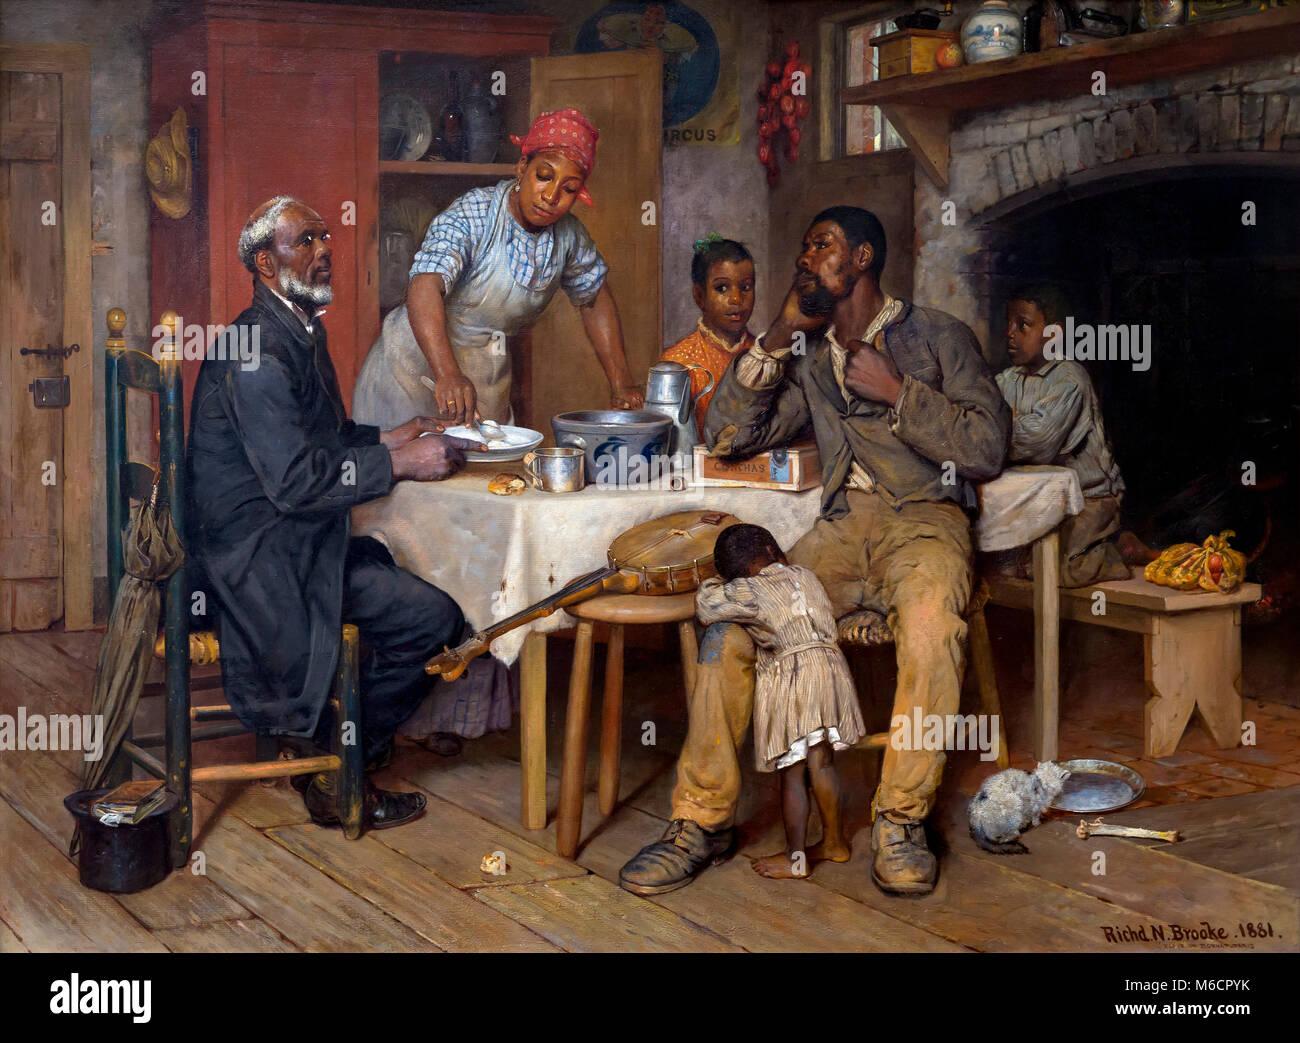 A Pastoral Visit, Richard Norris Brooke, 1881, National Gallery of Art, Washington DC, USA, North America - Stock Image